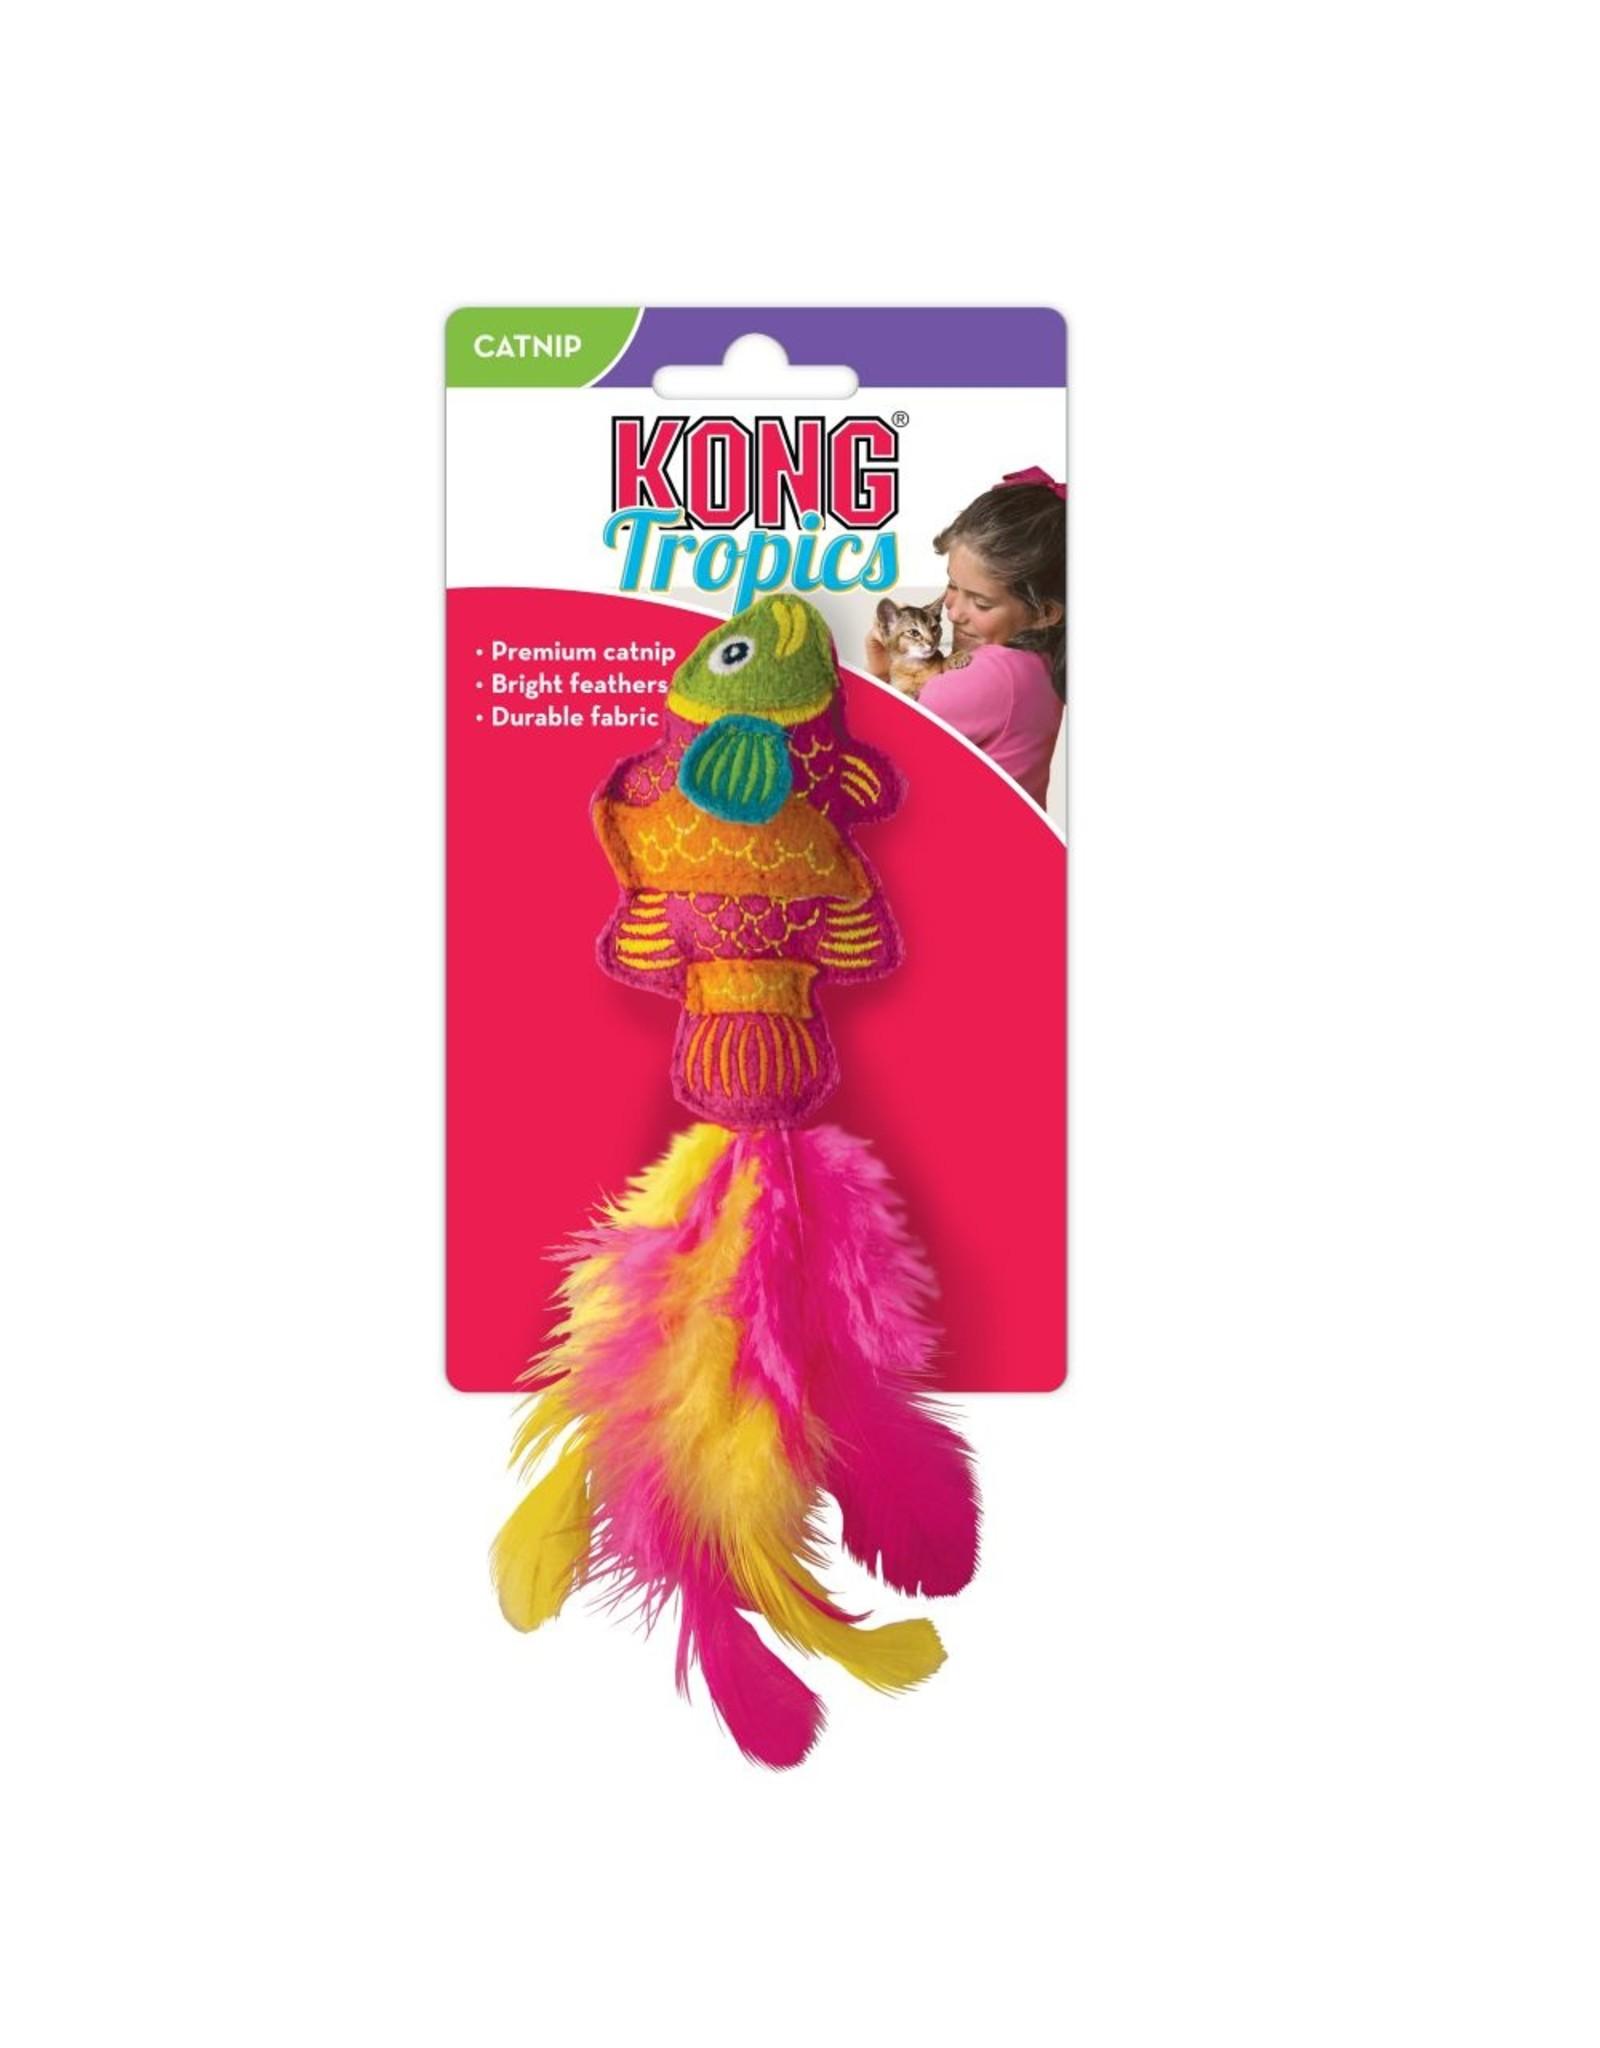 Kong Kong Tropics Pink Fish Wool and Catnip Cat Toy